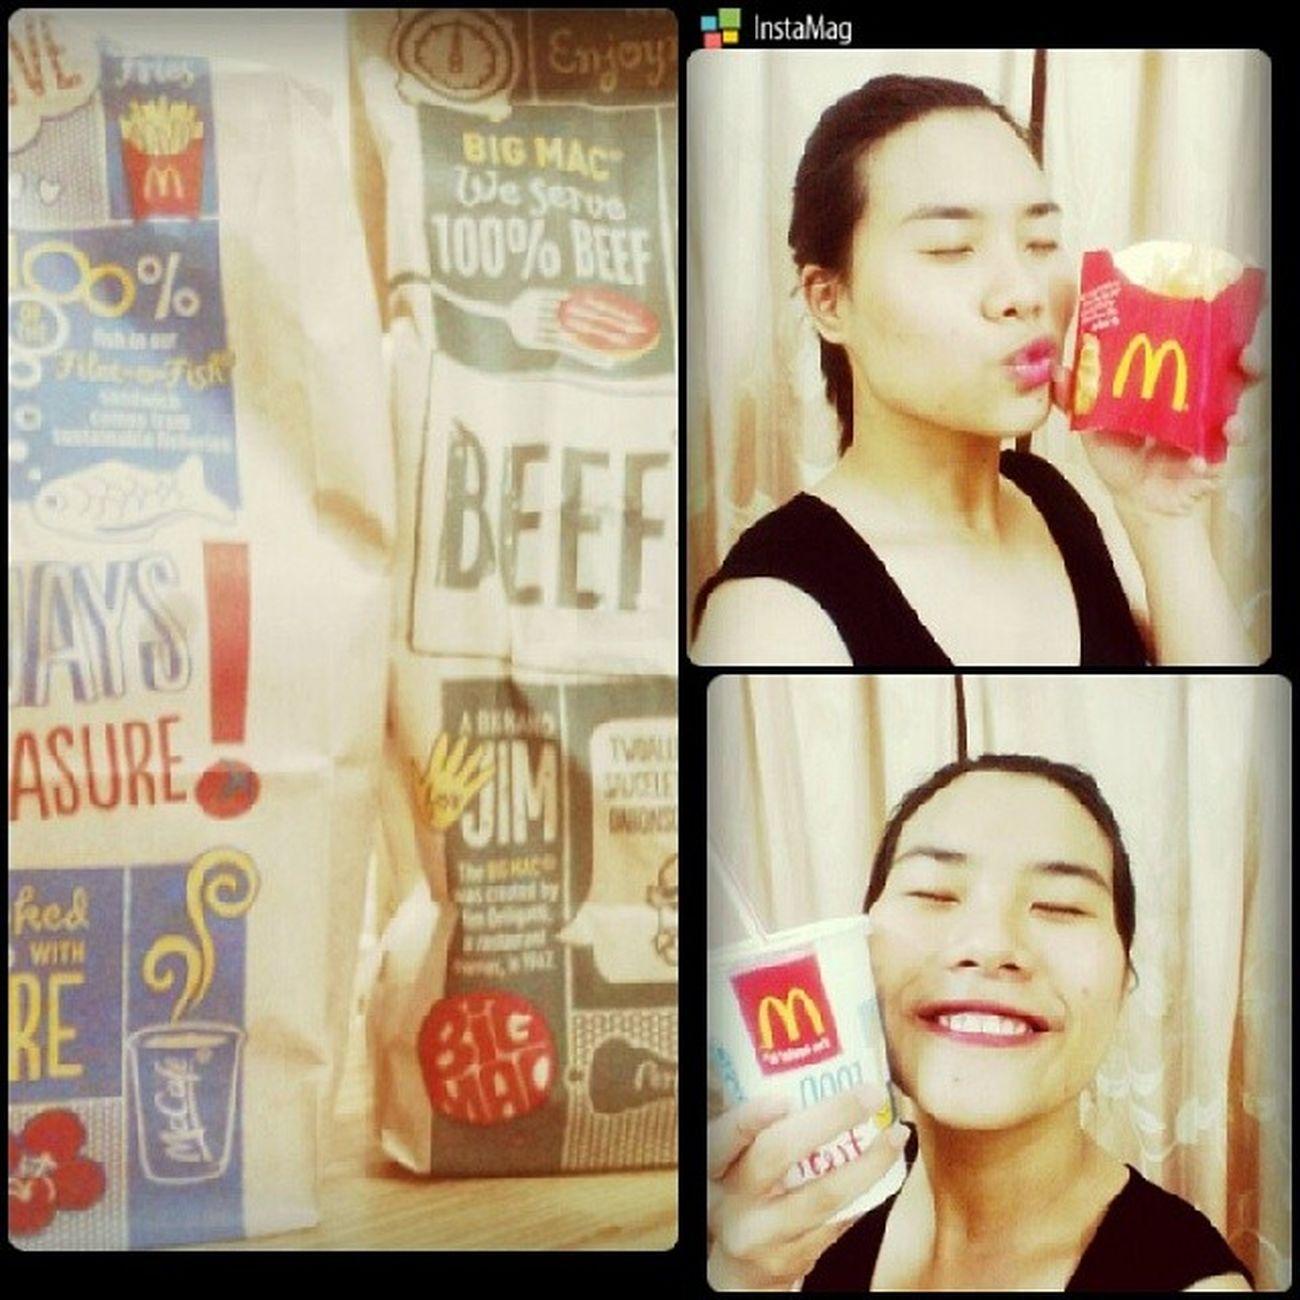 Fastfood Macdonal Drivethrough I 'mlovin'it :))foodaholic